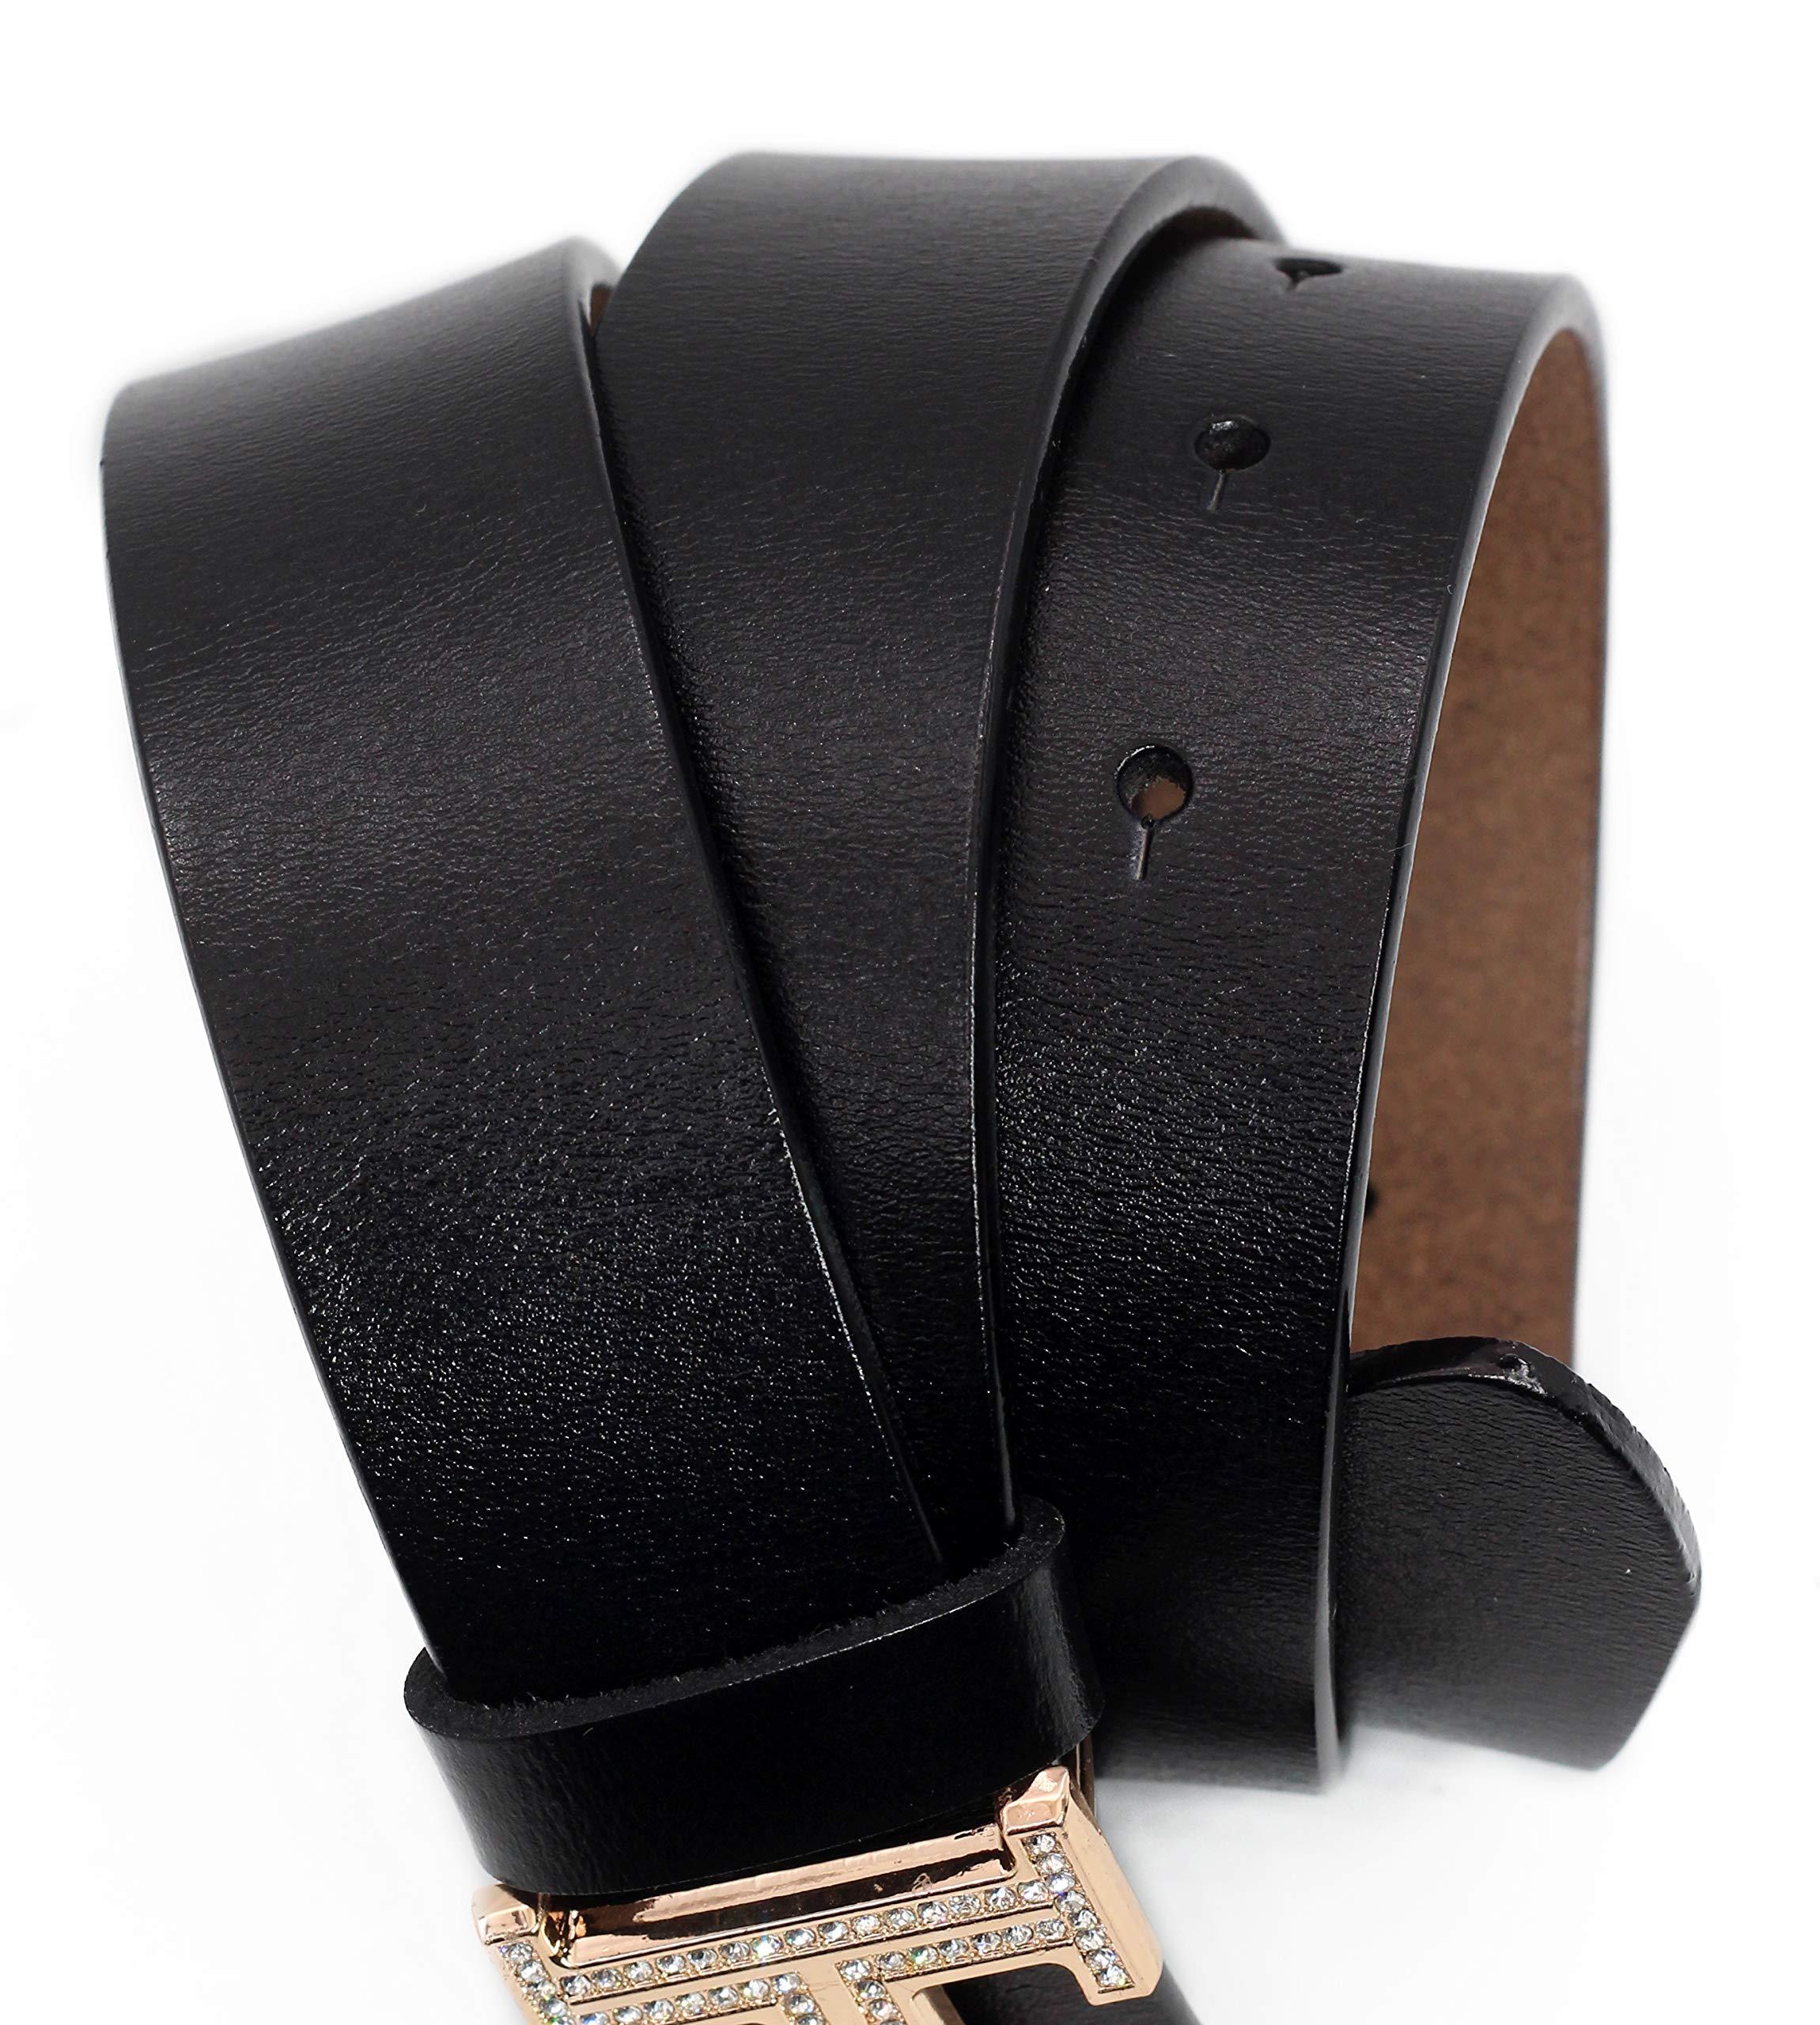 Women's Cowhide Leather Belt Fashion Buckle for Pants Jeans Shorts Ladies Design Genuine Belts (110cm/43.3'', pants size 29''-34'', Style 2- Black) by DUOAI (Image #6)